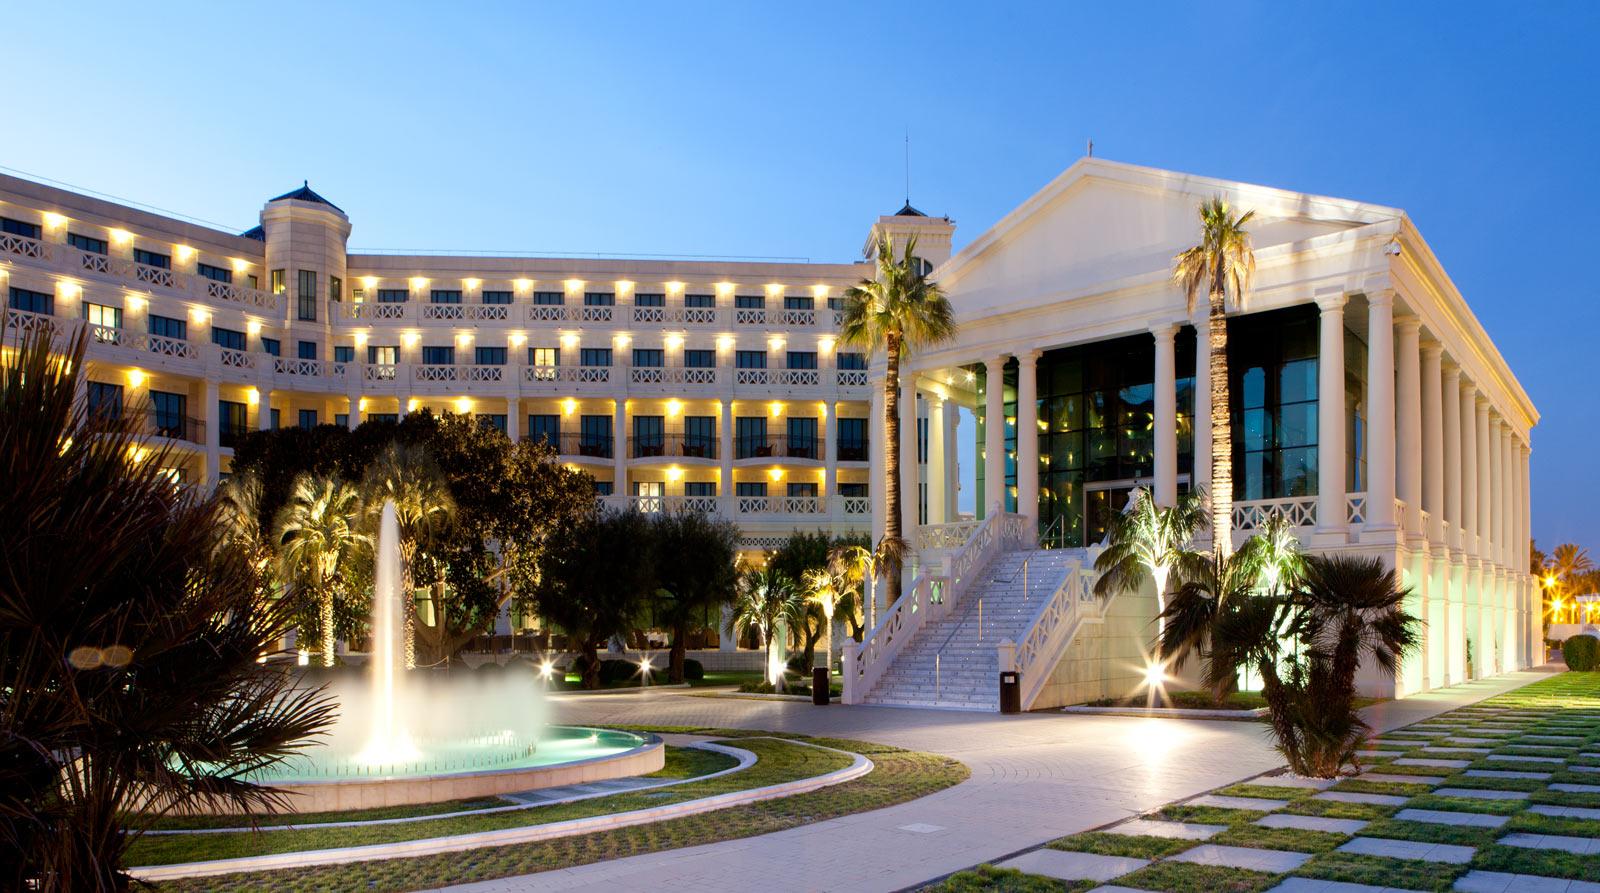 Hotellasarenas-guidersvalencia